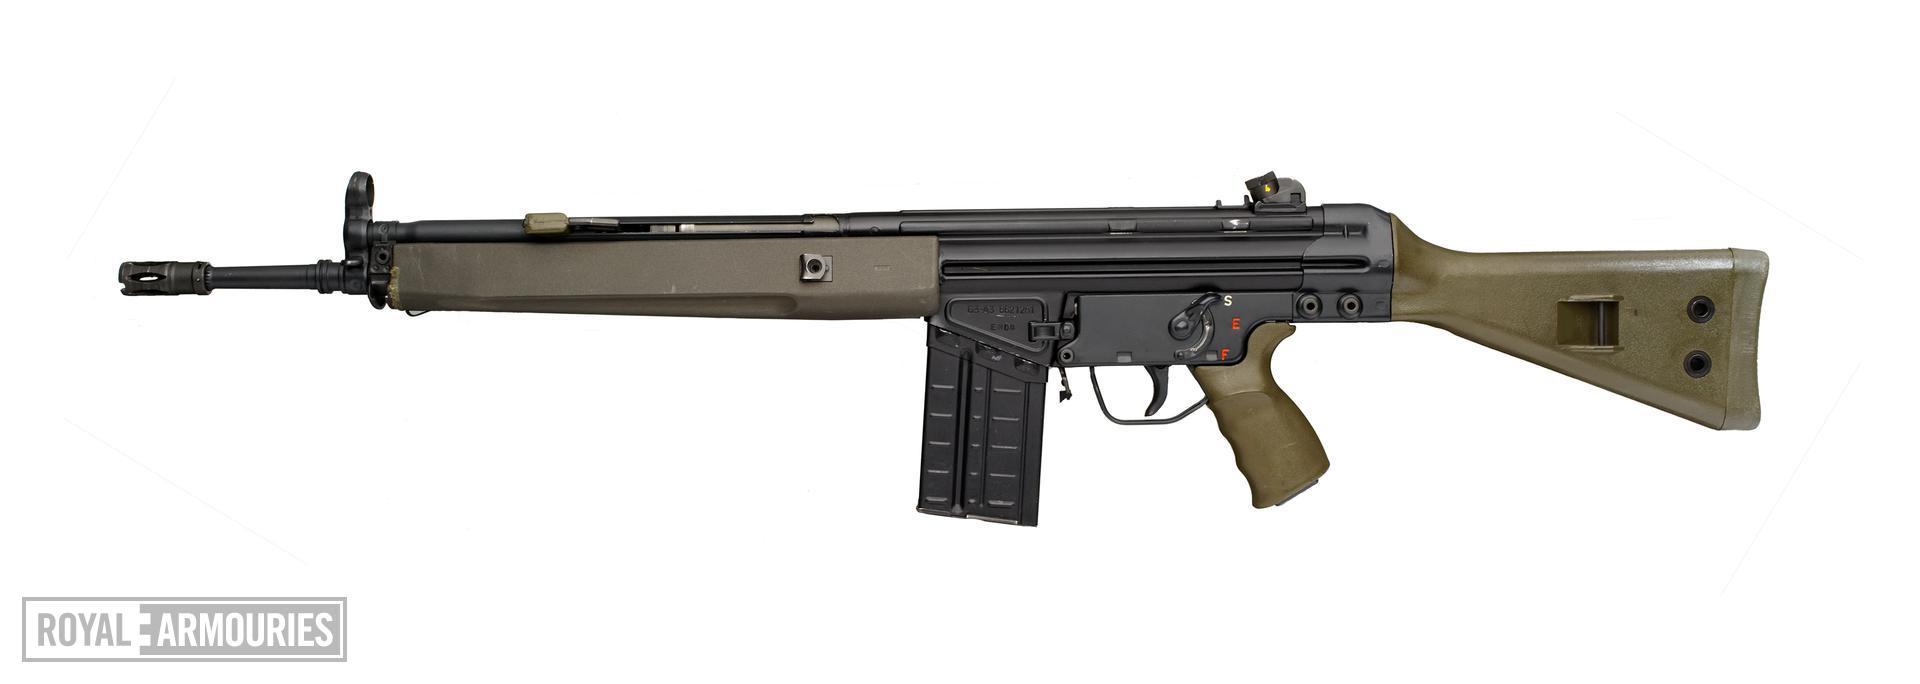 Centrefire automatic rifle - G3A3